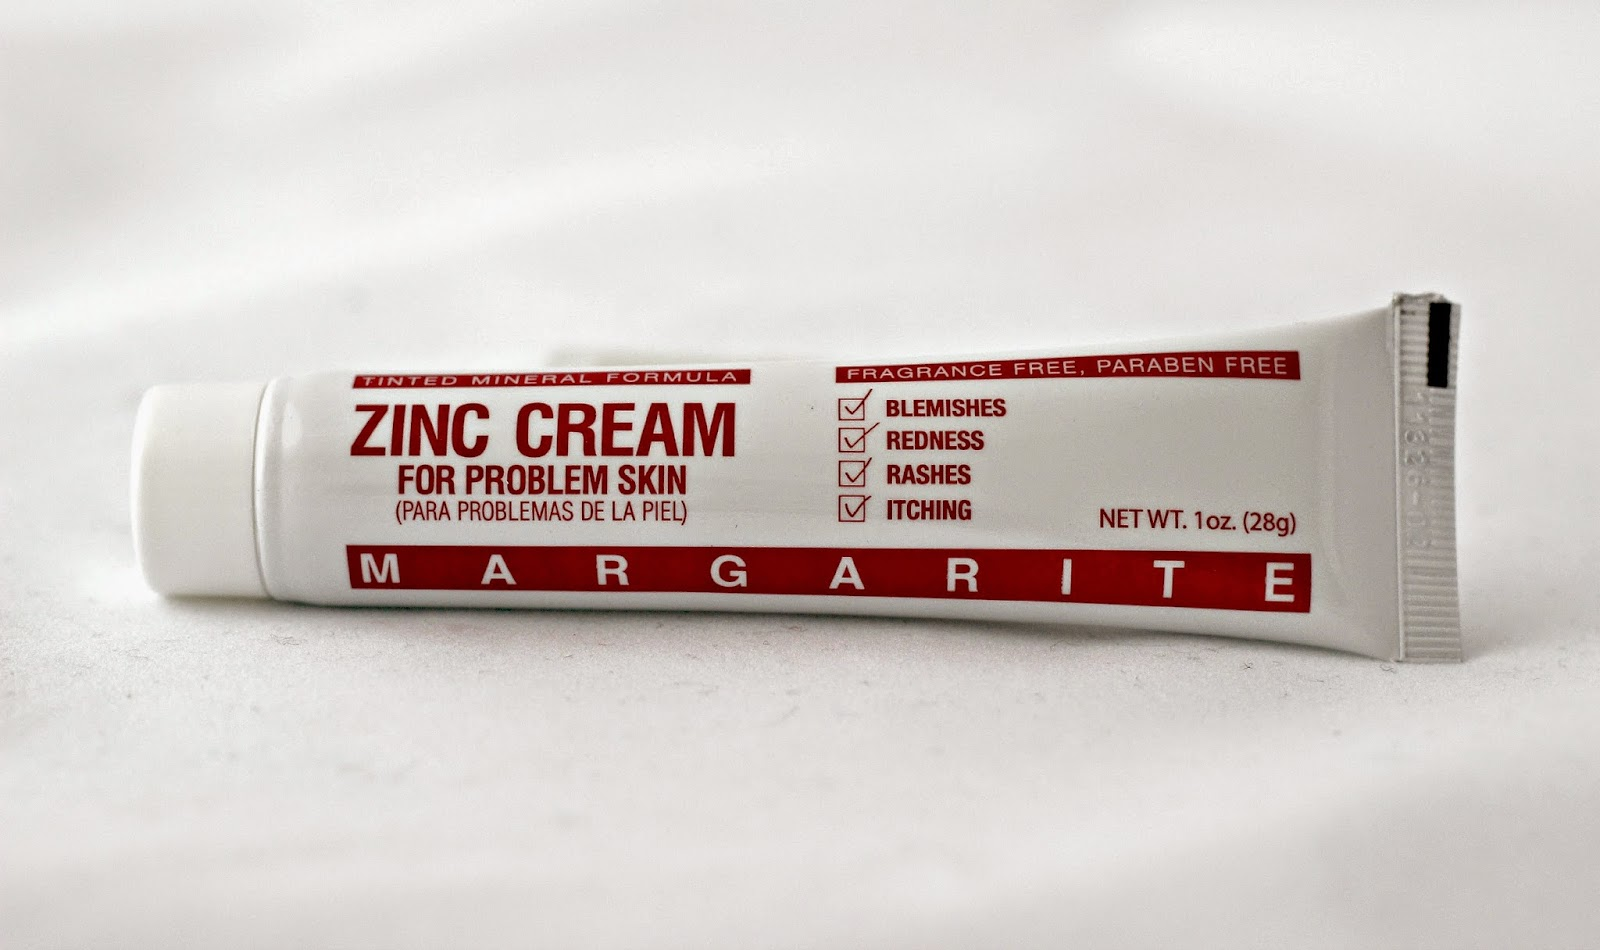 Margarite Zinc Cream for Problem Skin